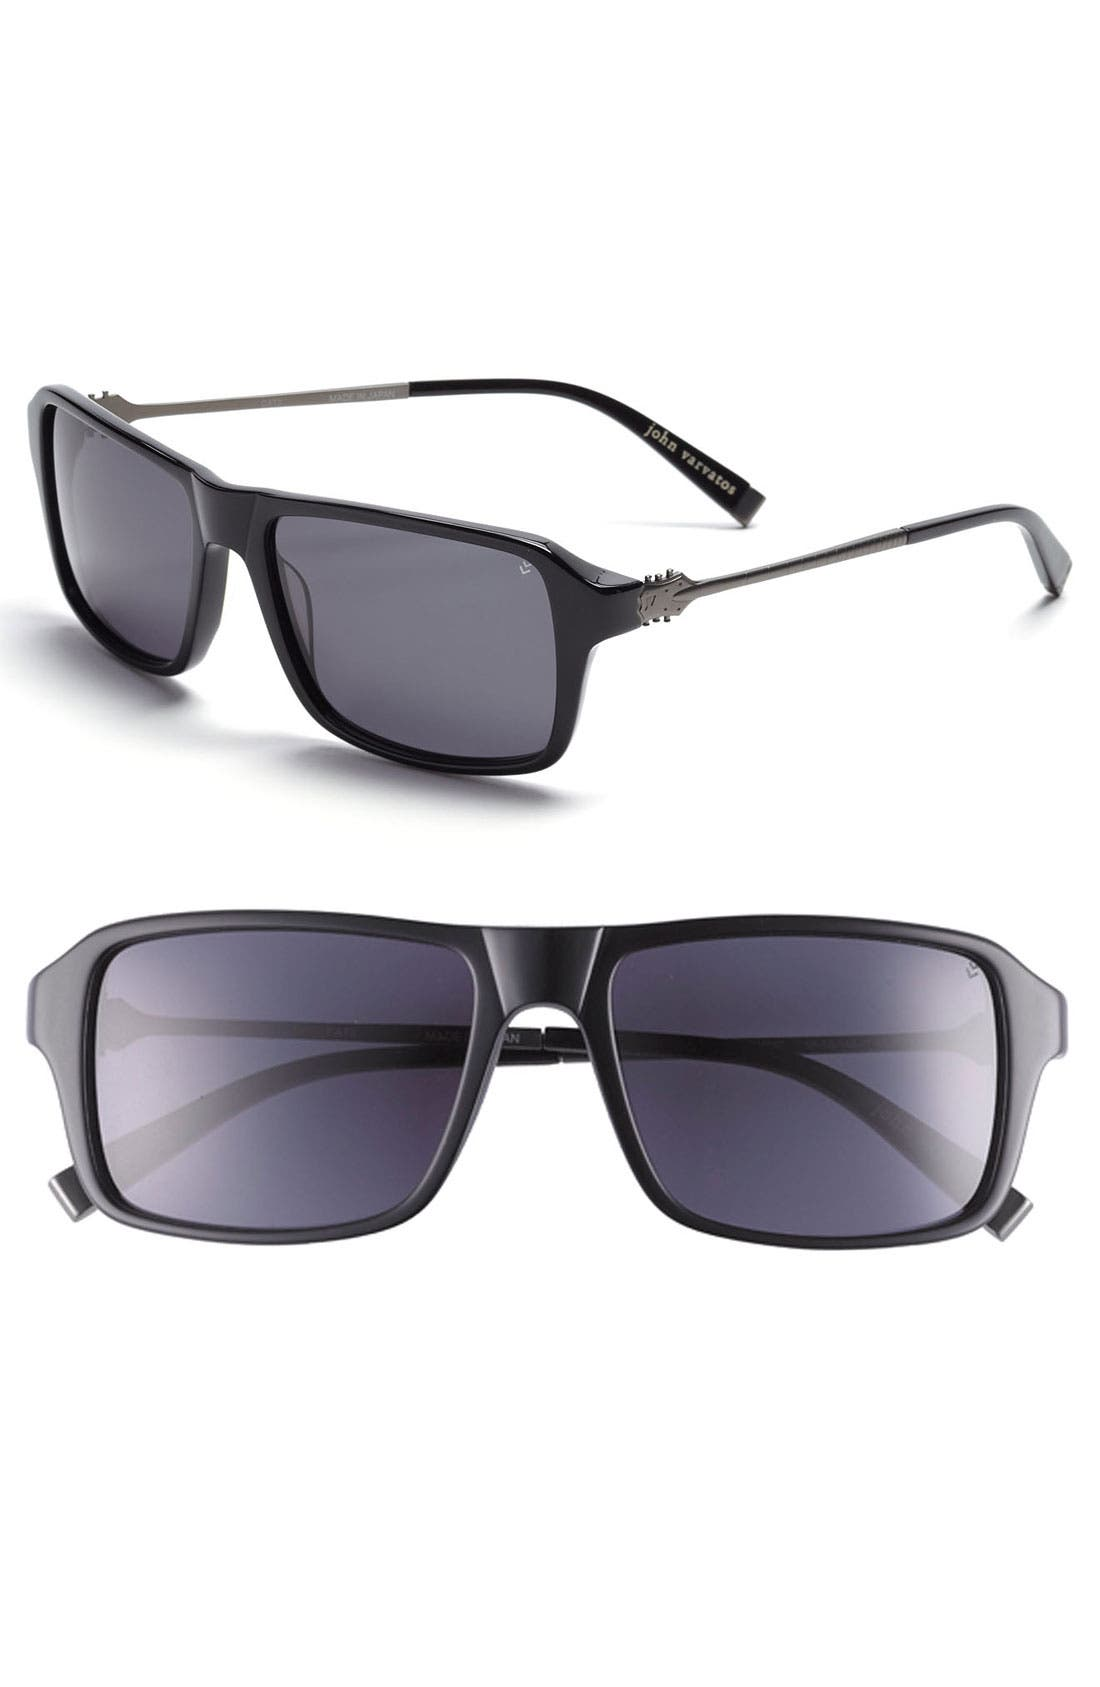 Main Image - John Varvatos Collection 58mm Sunglasses